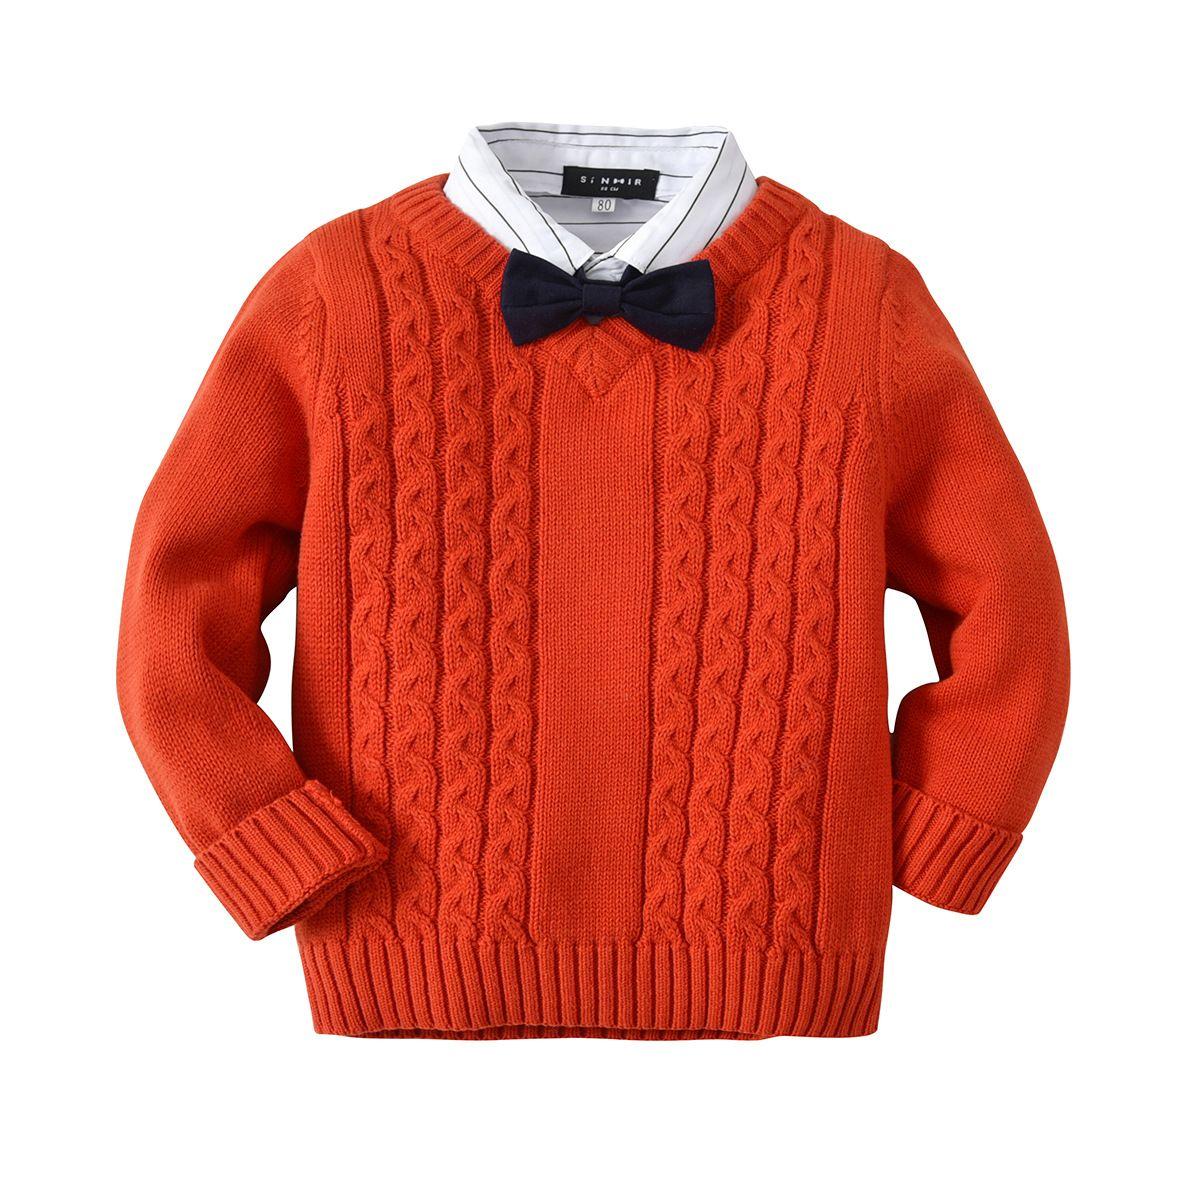 Kinder Pullover Jungen Pullover Kinder Pullover 2018 Frühling Herbst Baby Junge Gestrickte Obere Winterkleidung